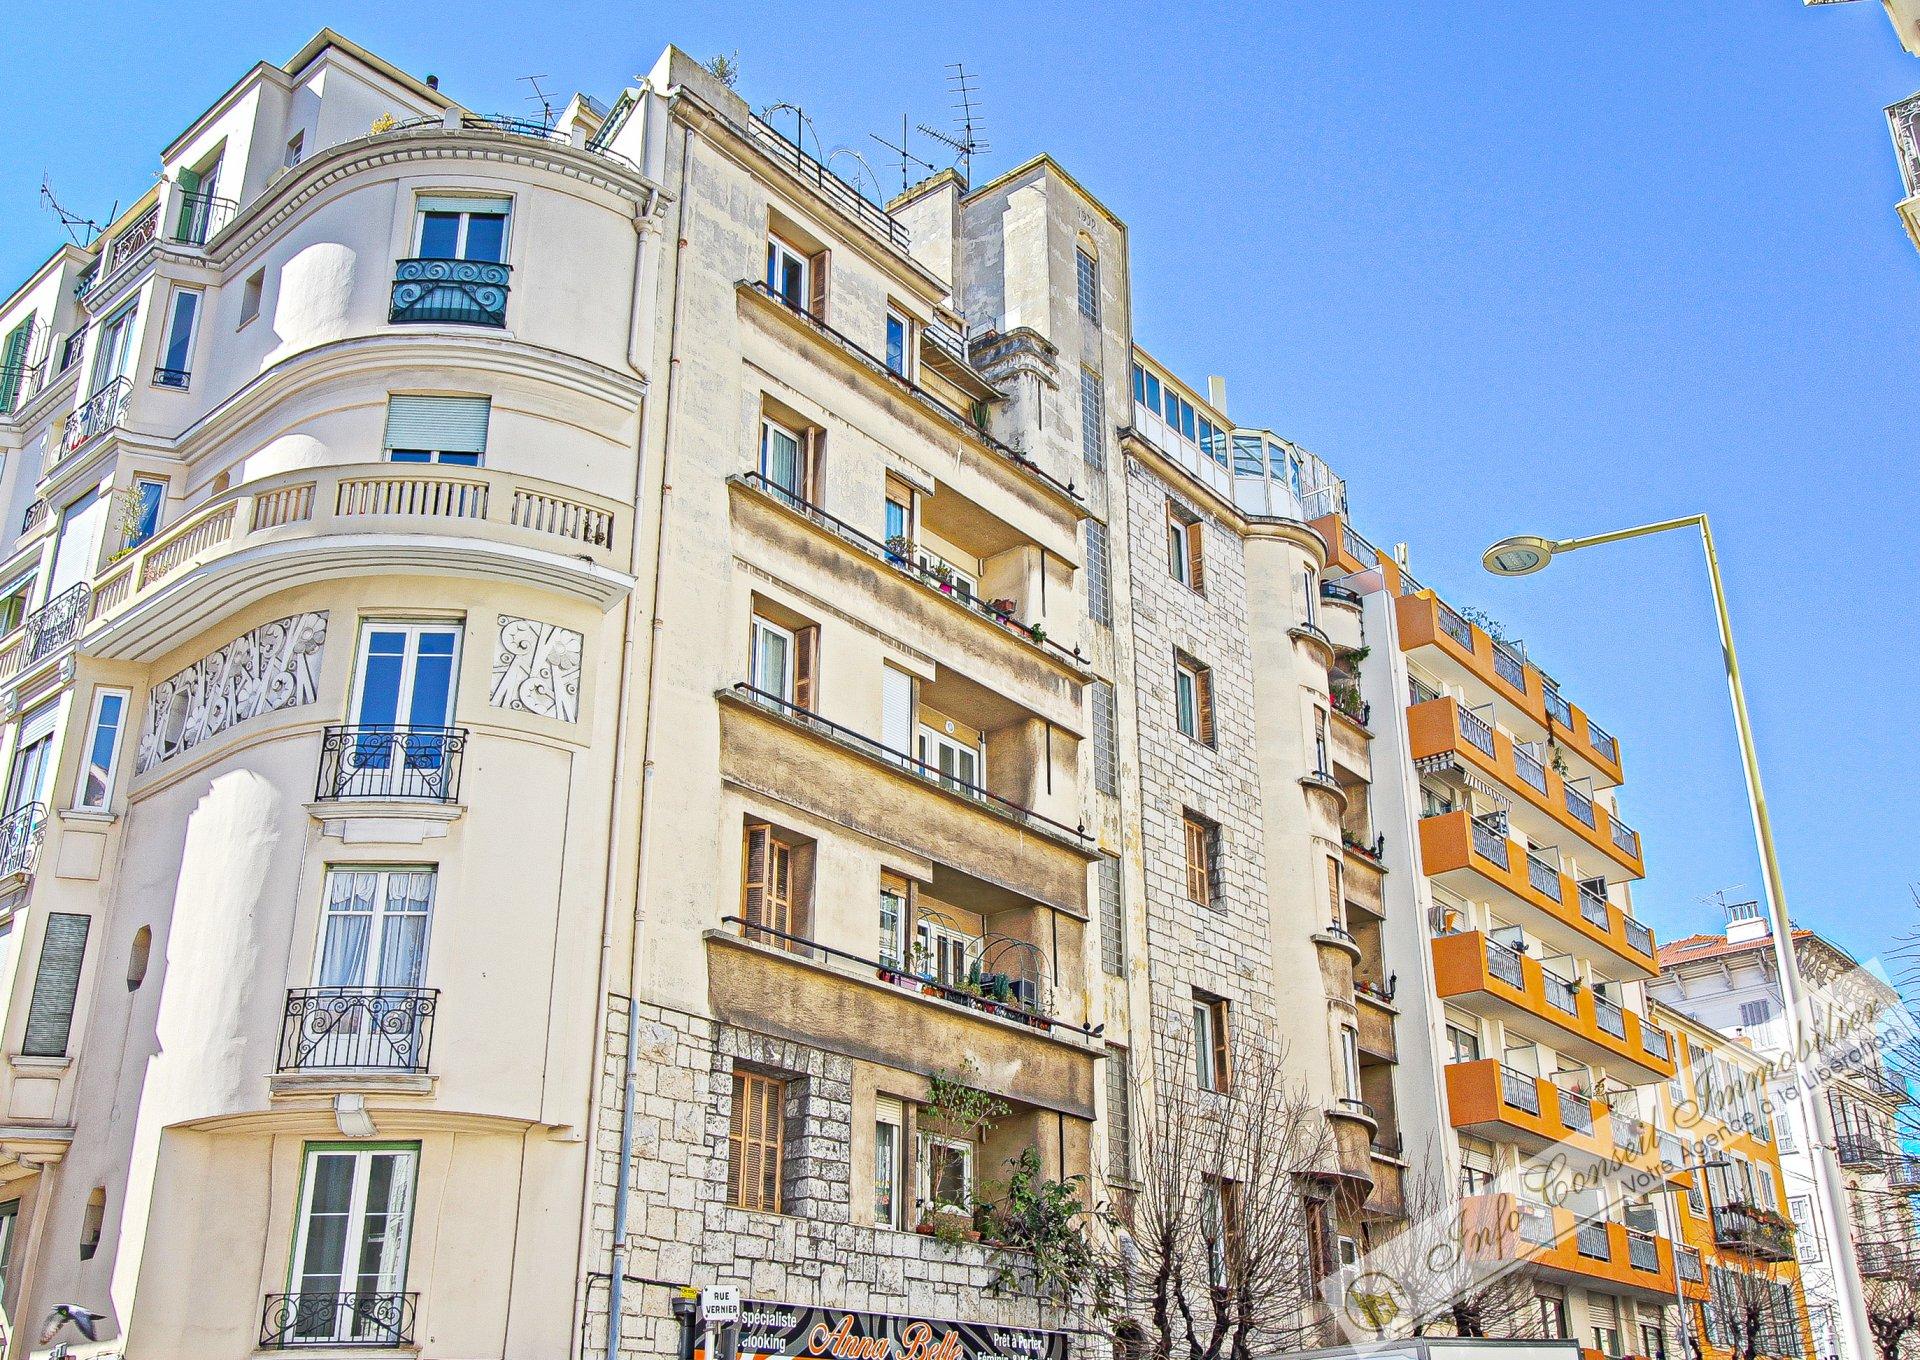 LIBERATION - Dernier étage - 4P - 87m² - Véranda - 370.000 €